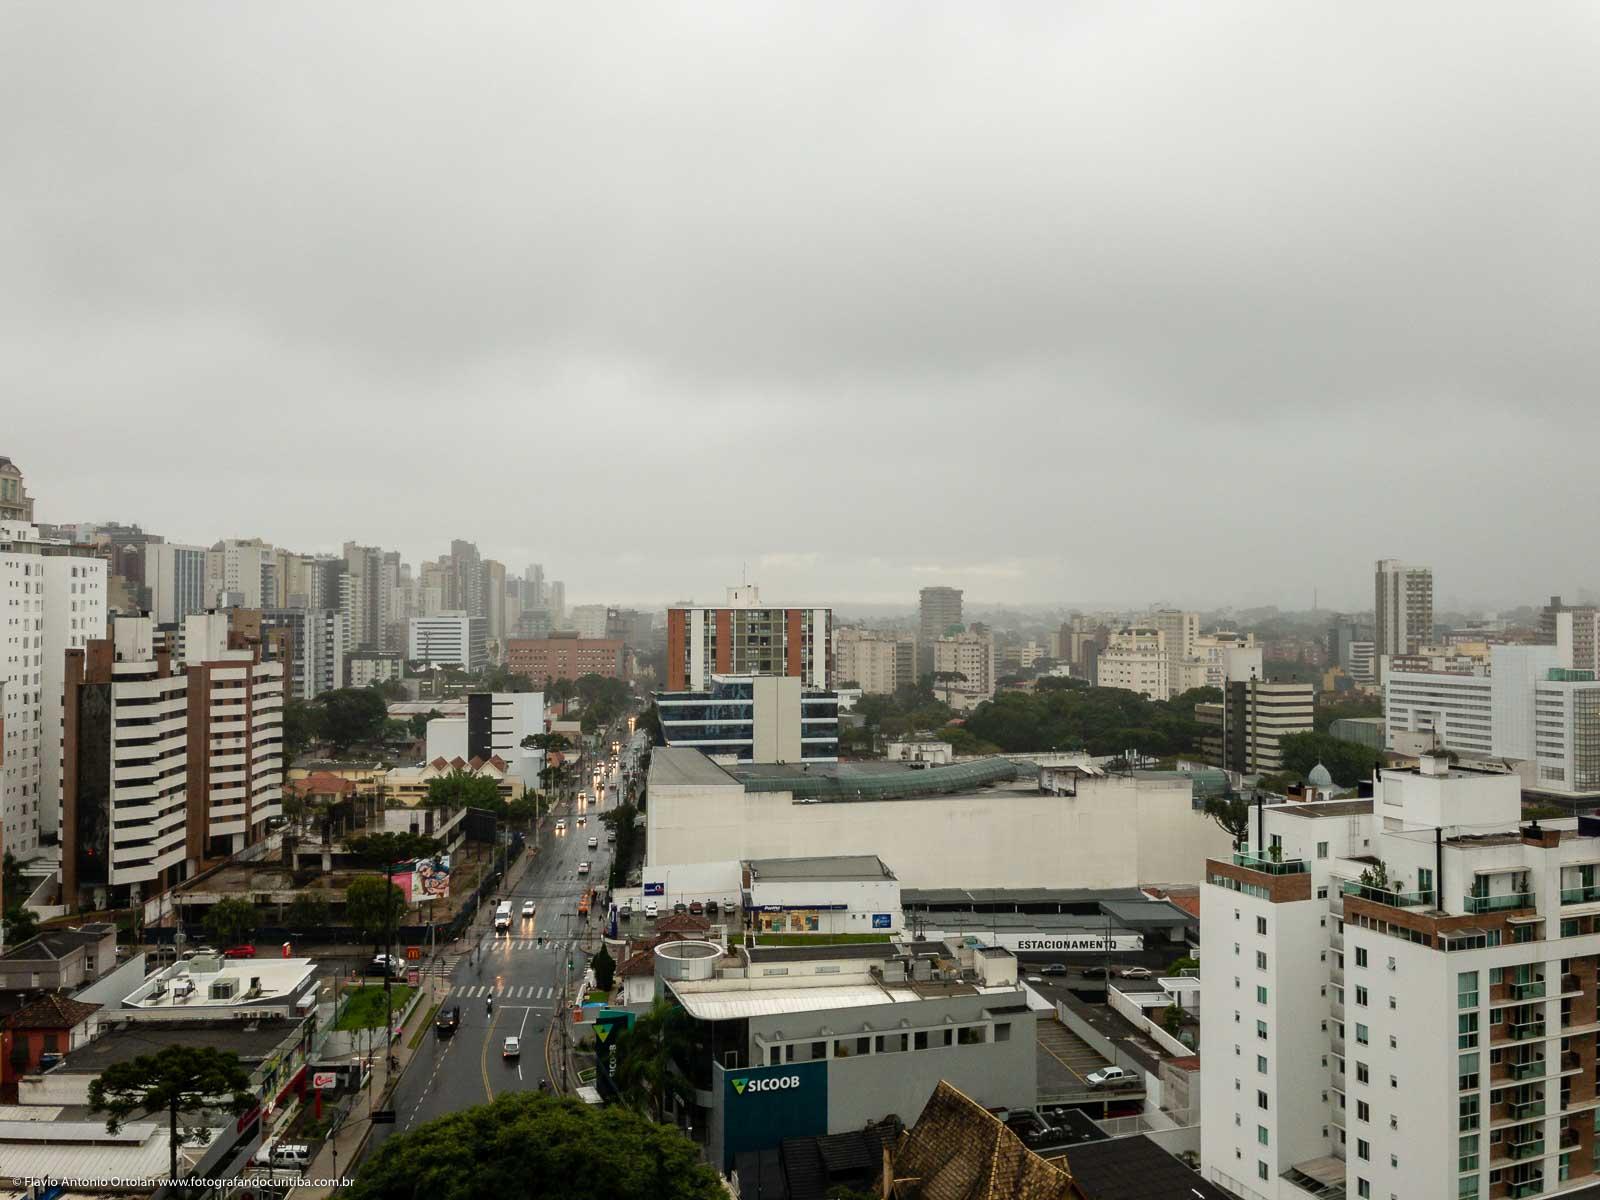 Fotografando Curitiba: Maio 2019